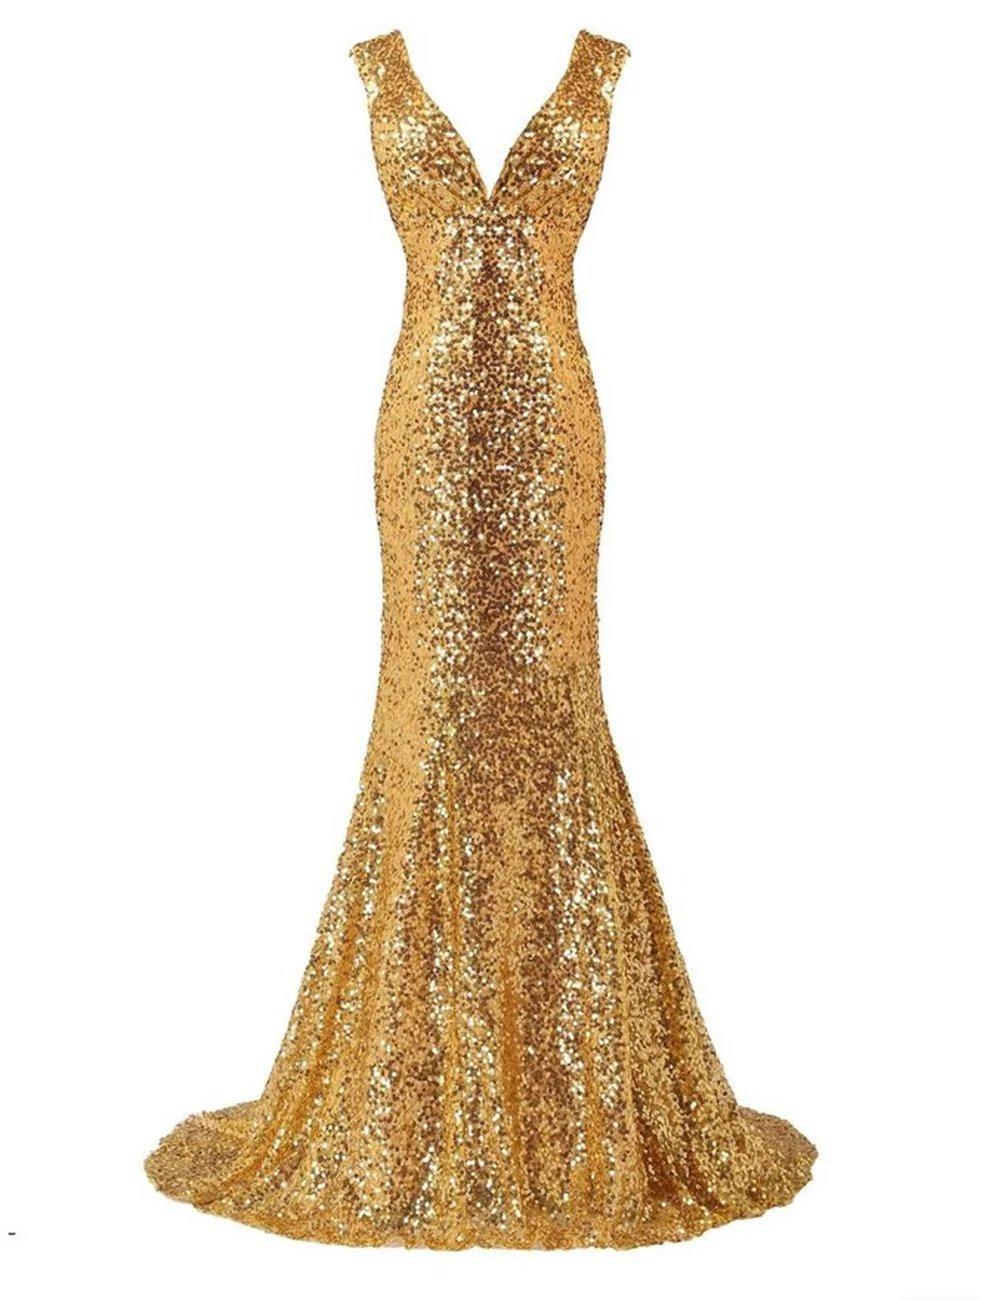 LanierWedding Gold Sequins Mermaid V Neck Bridesmaid Dresses Plus Size Prom  Dresses Gold Size 16